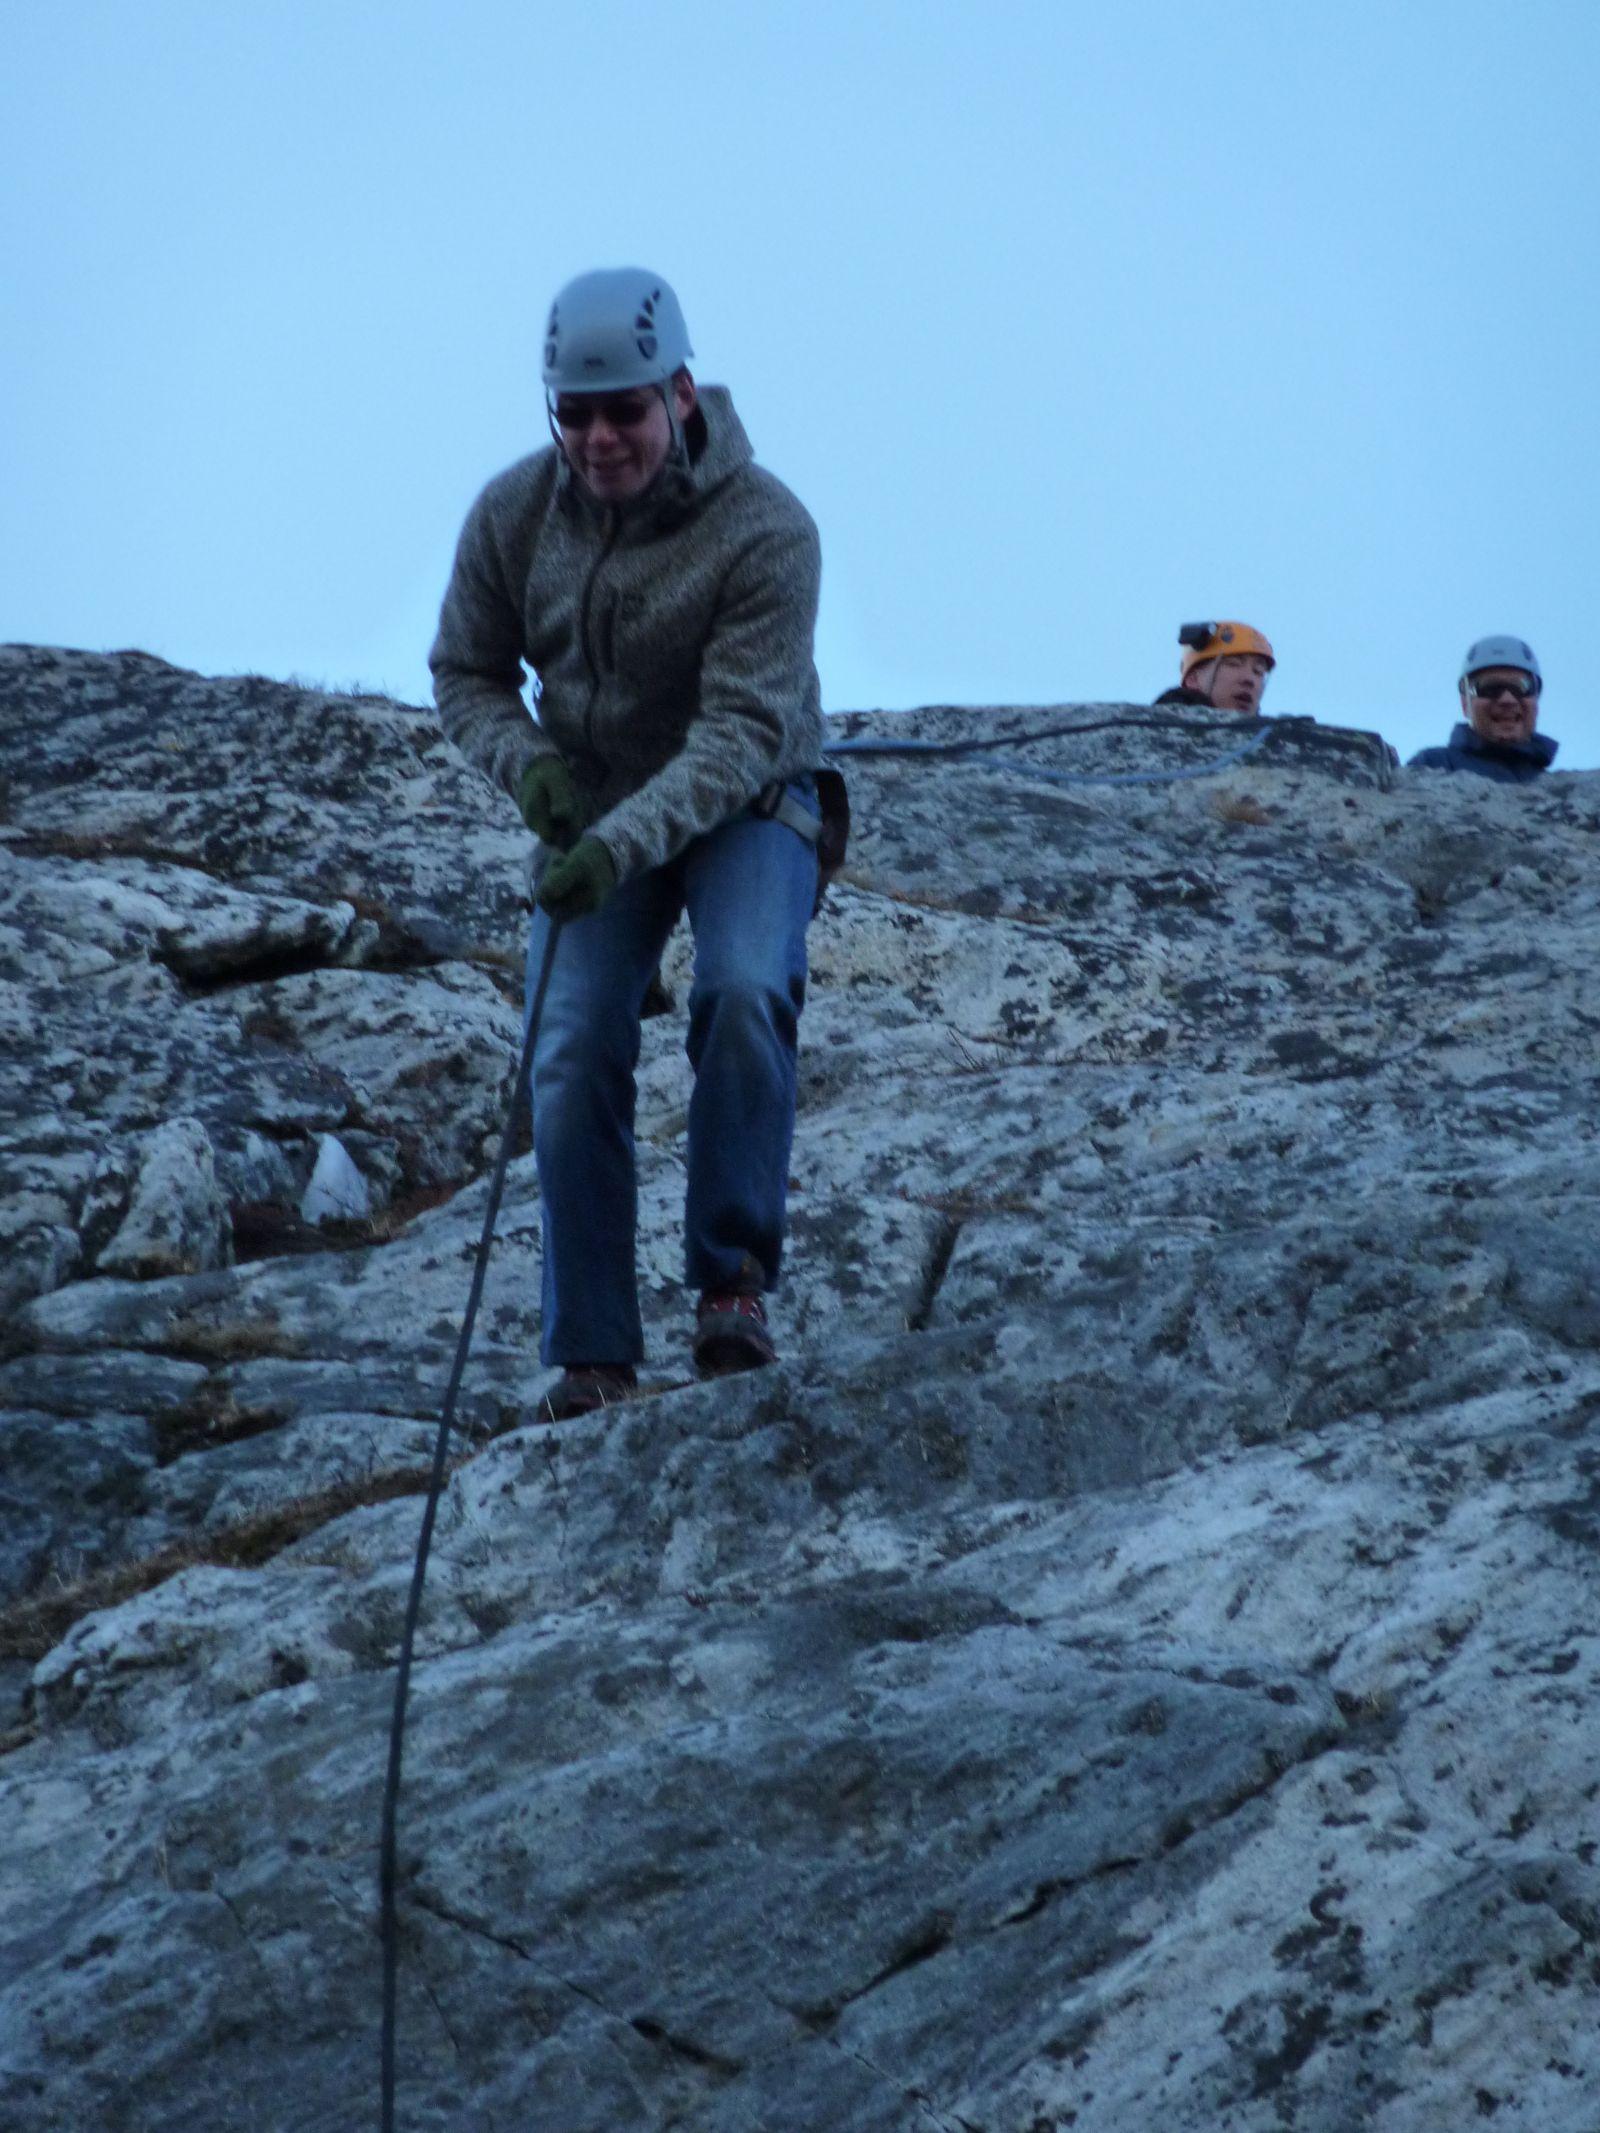 2010-04-10-1640_-_John Telling; Svend Sværd_3